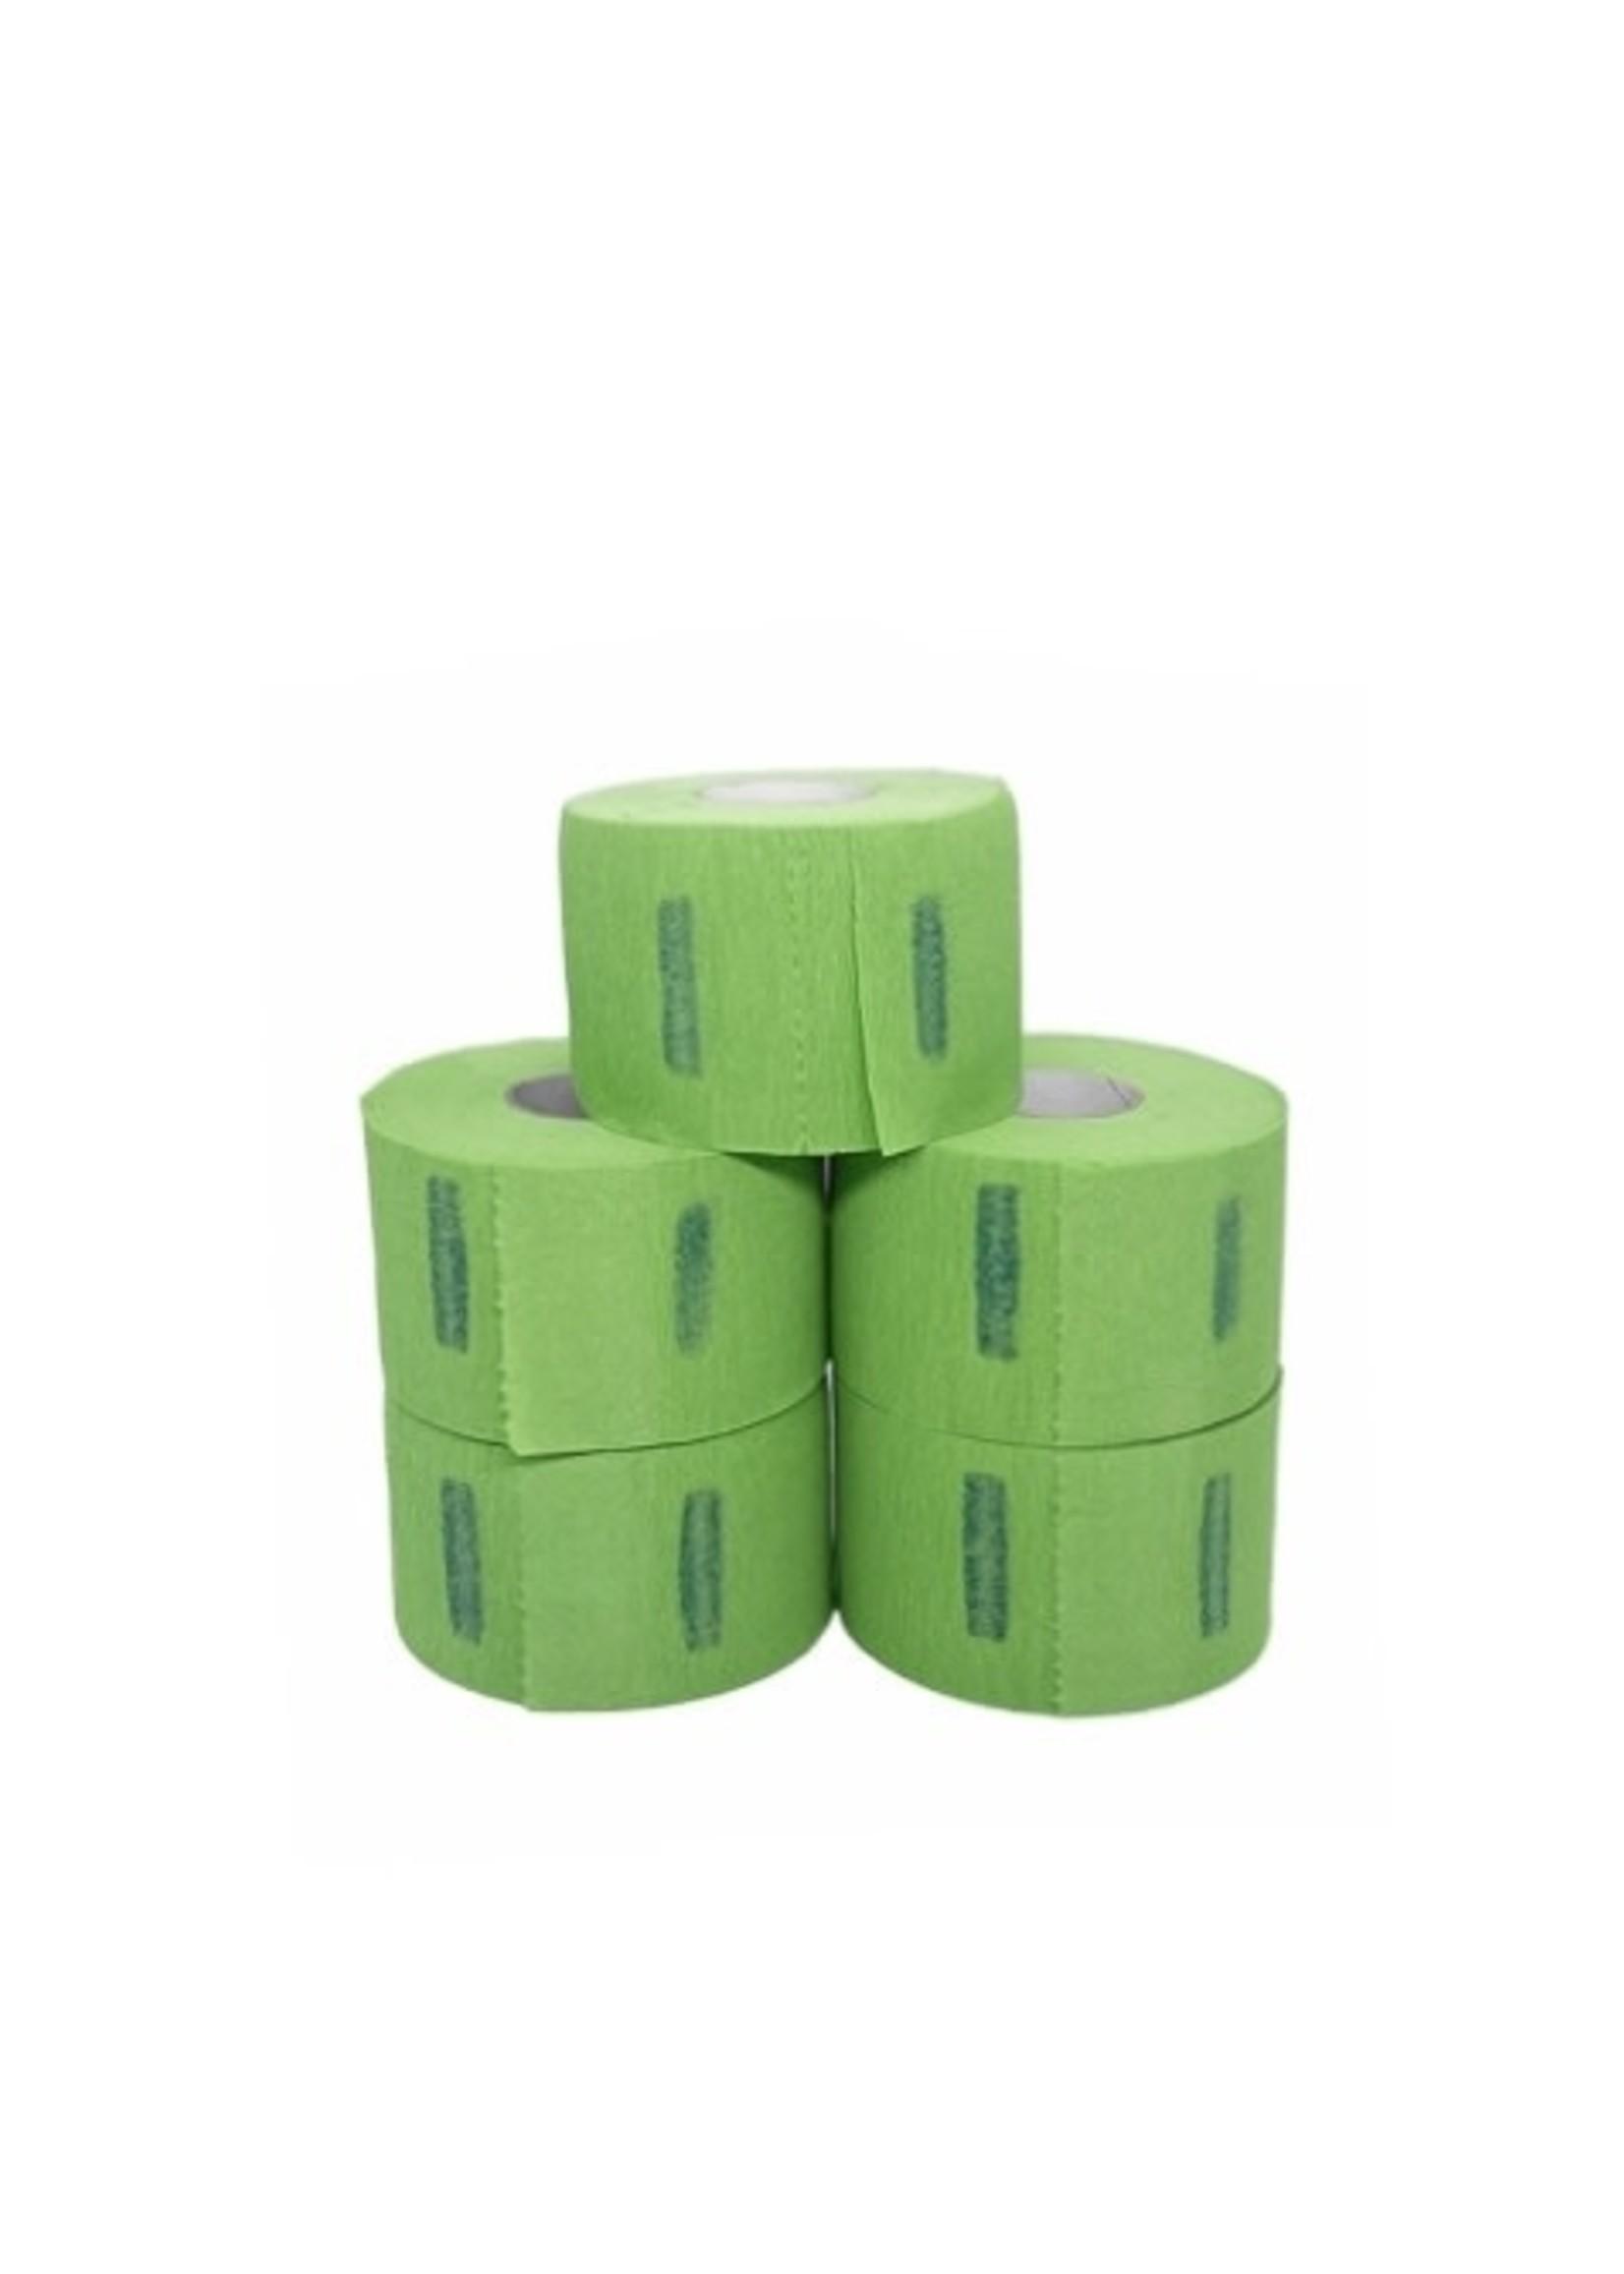 Level 3 L3-5 Rolls Neck Strips- Green